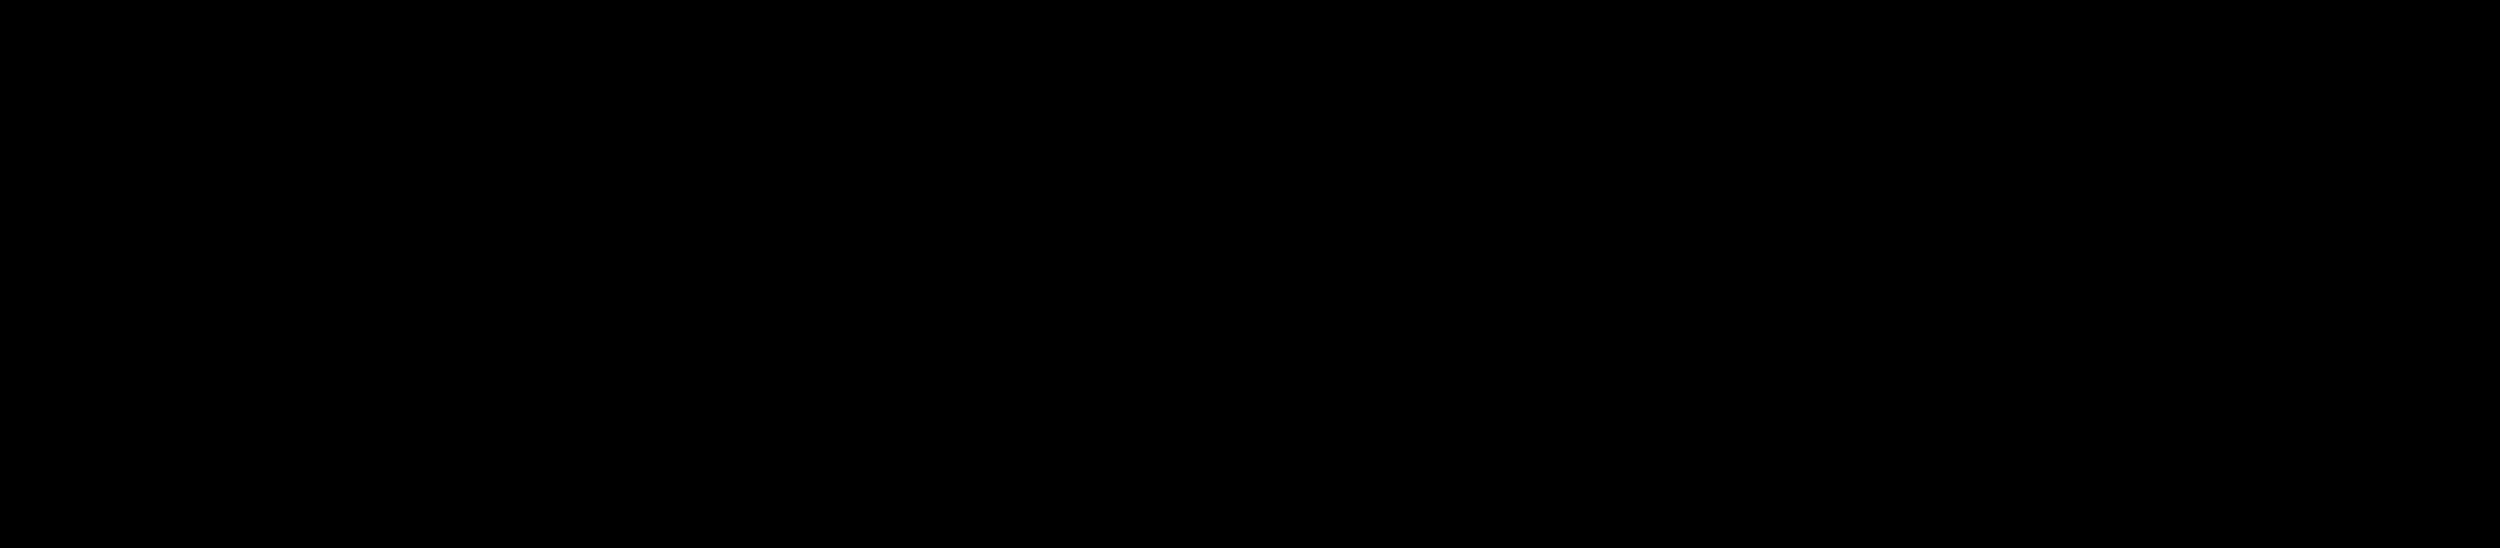 Pigtronix_logo.png